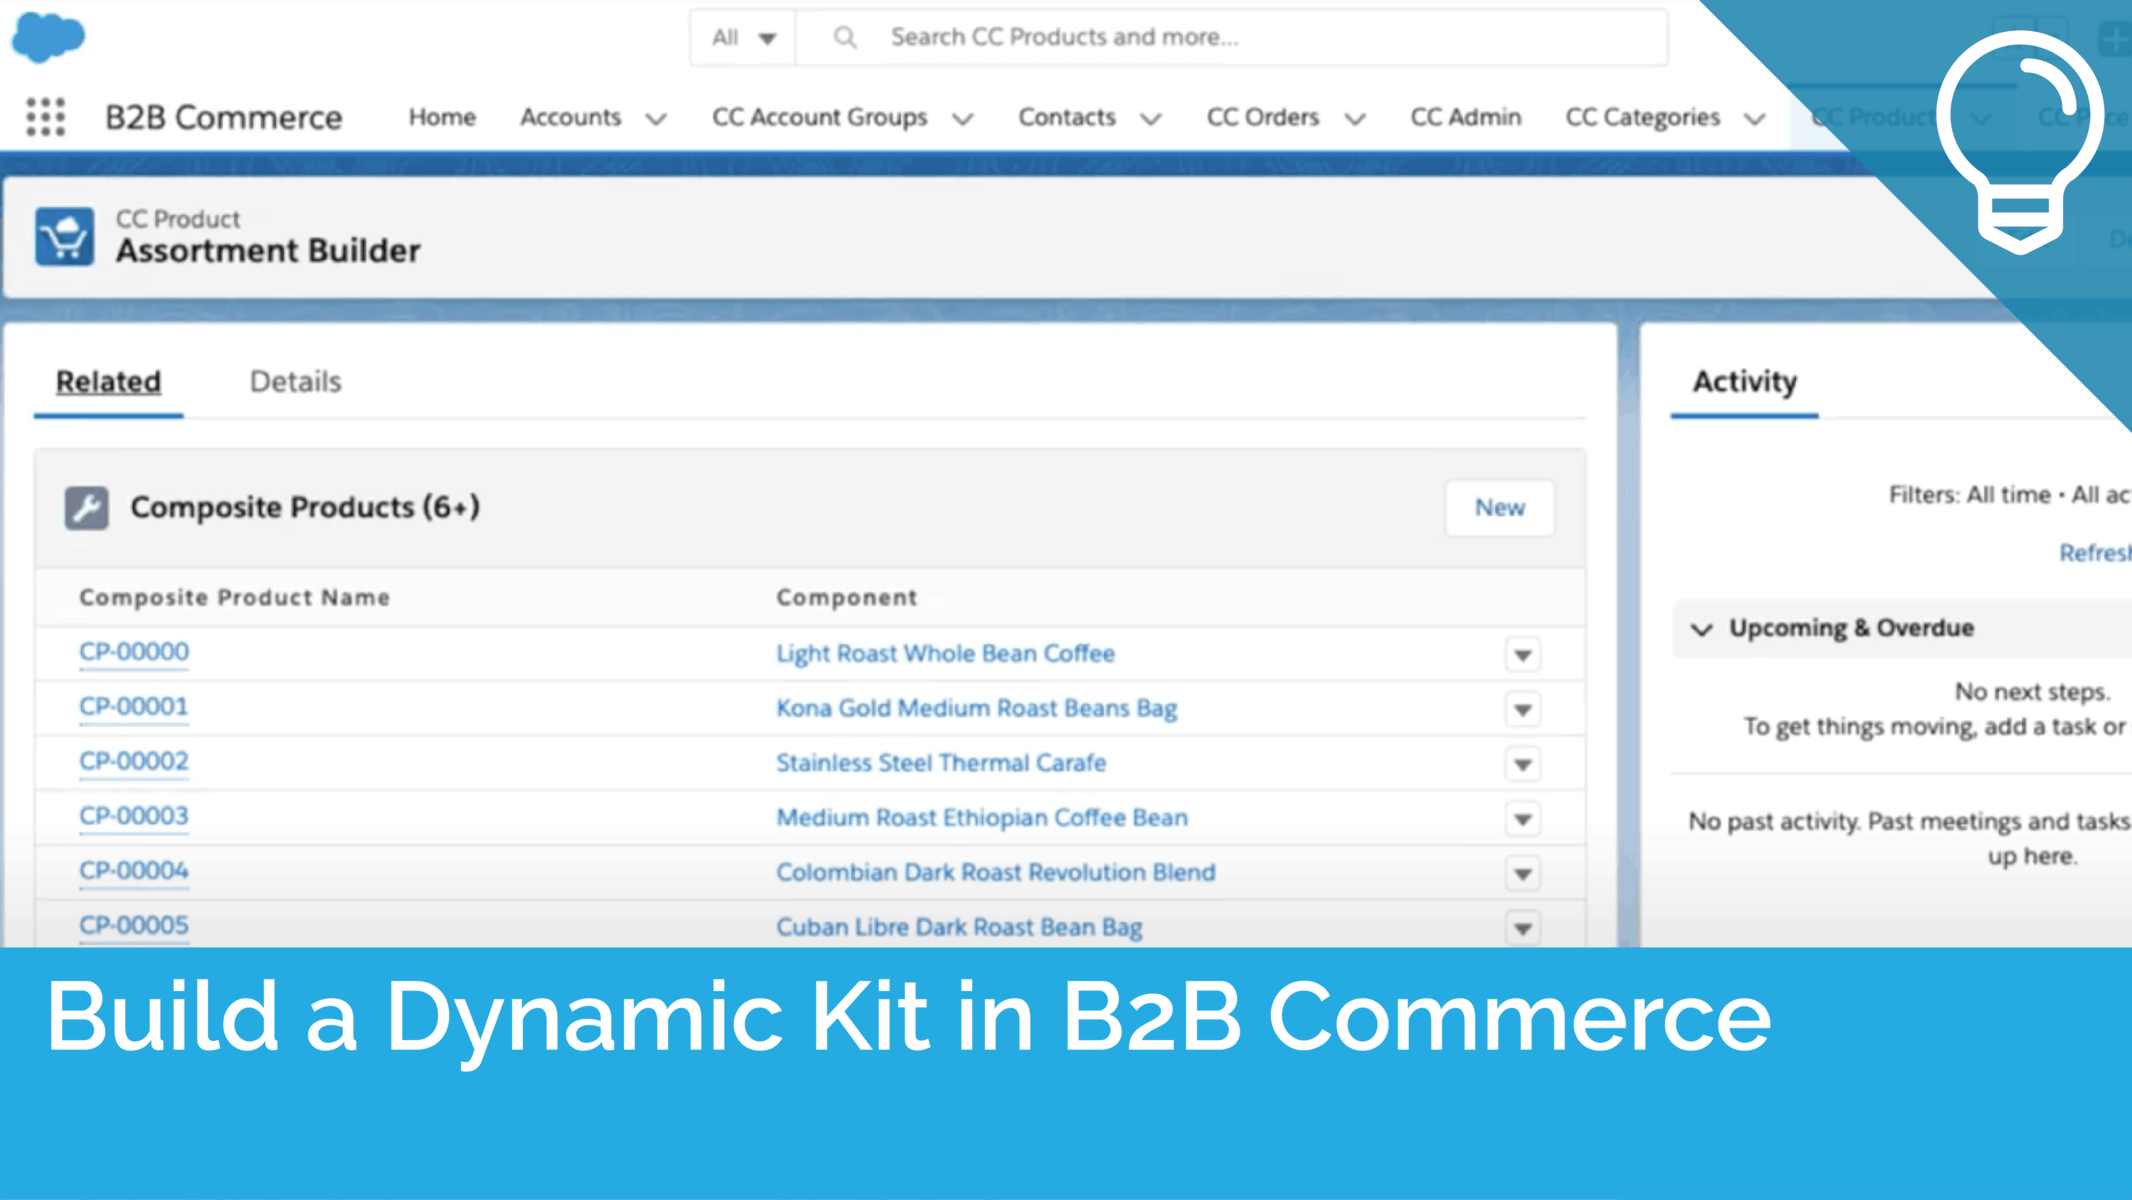 Build a Dynamic Kit in B2B Commerce